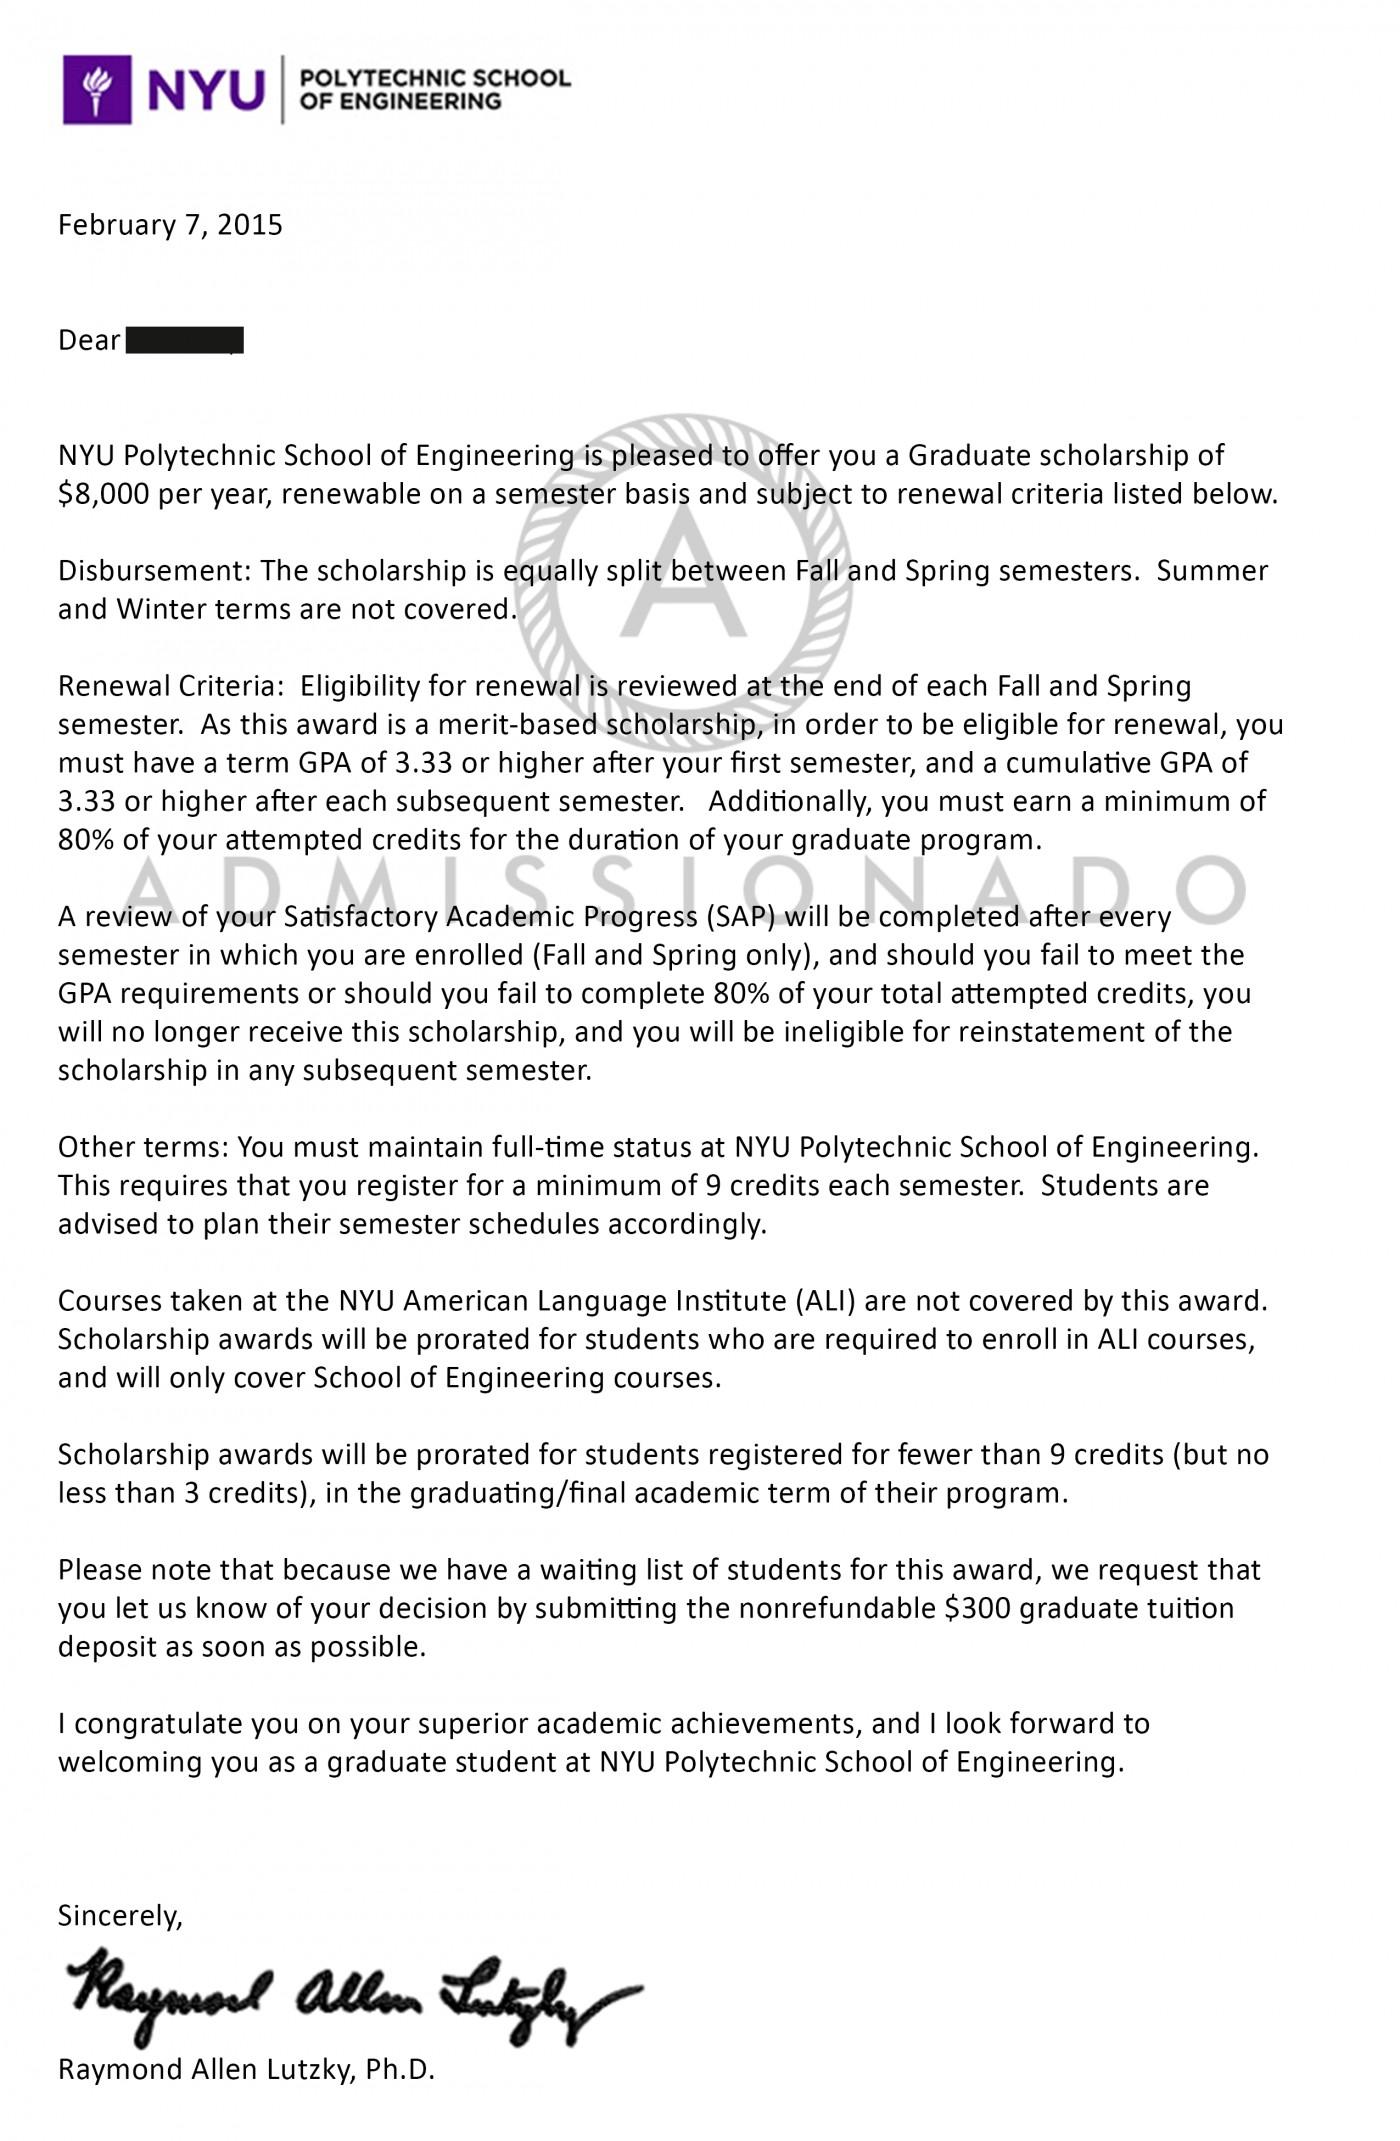 Buy college application essay nyu